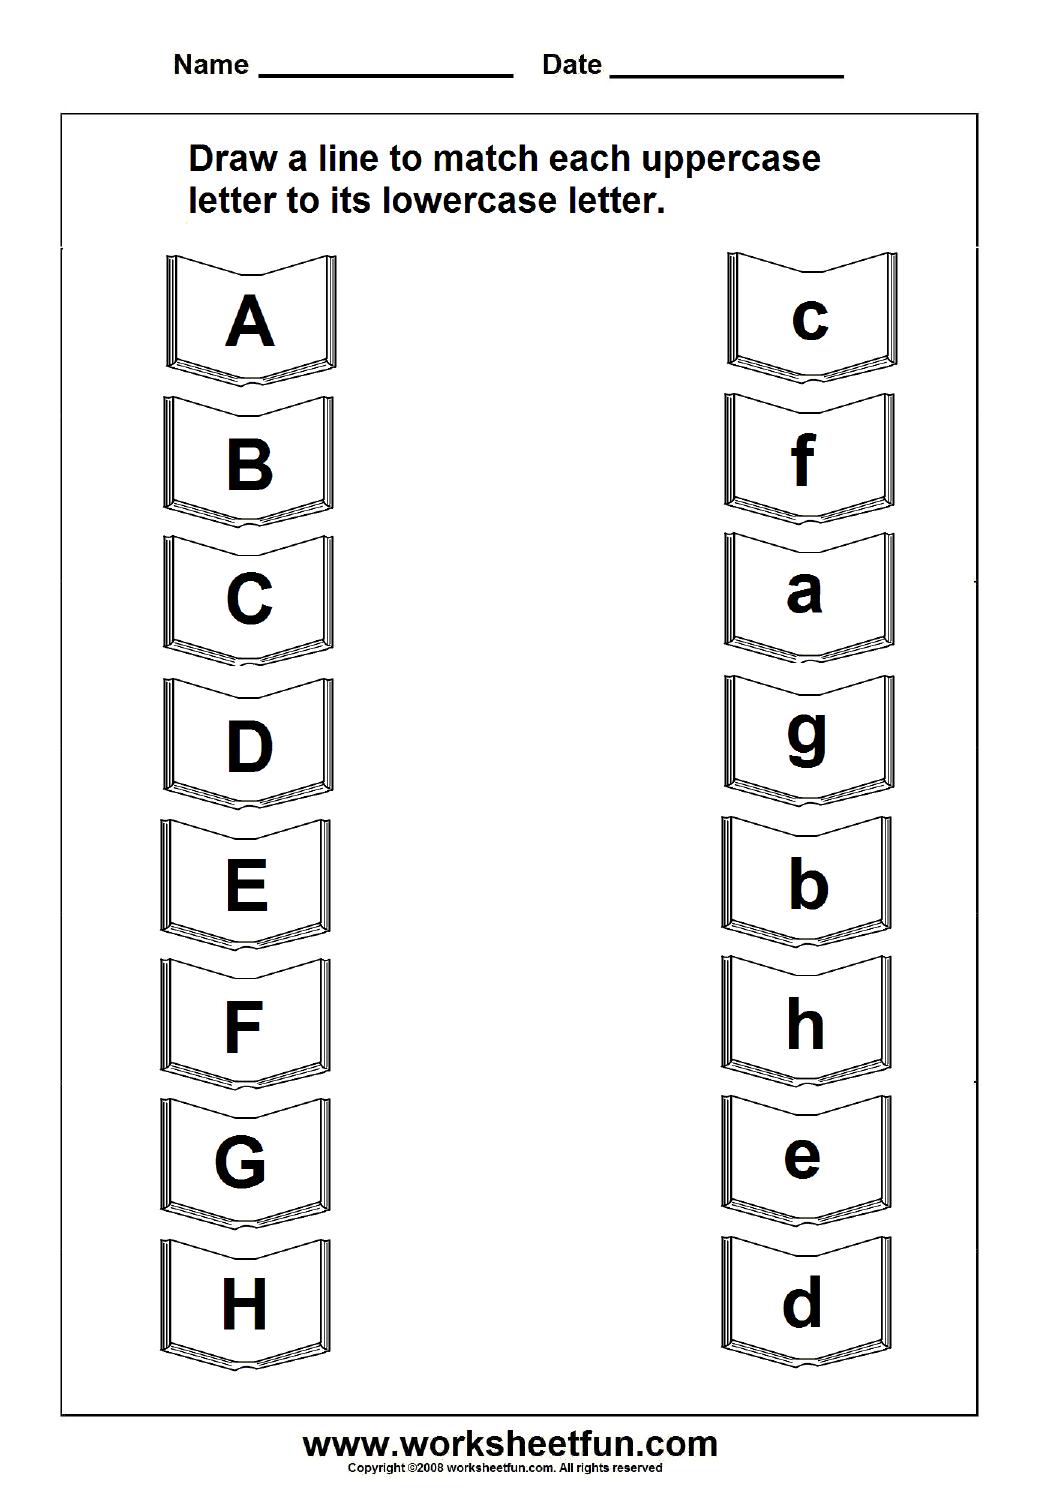 Abc Matching Worksheets Worksheets Samples